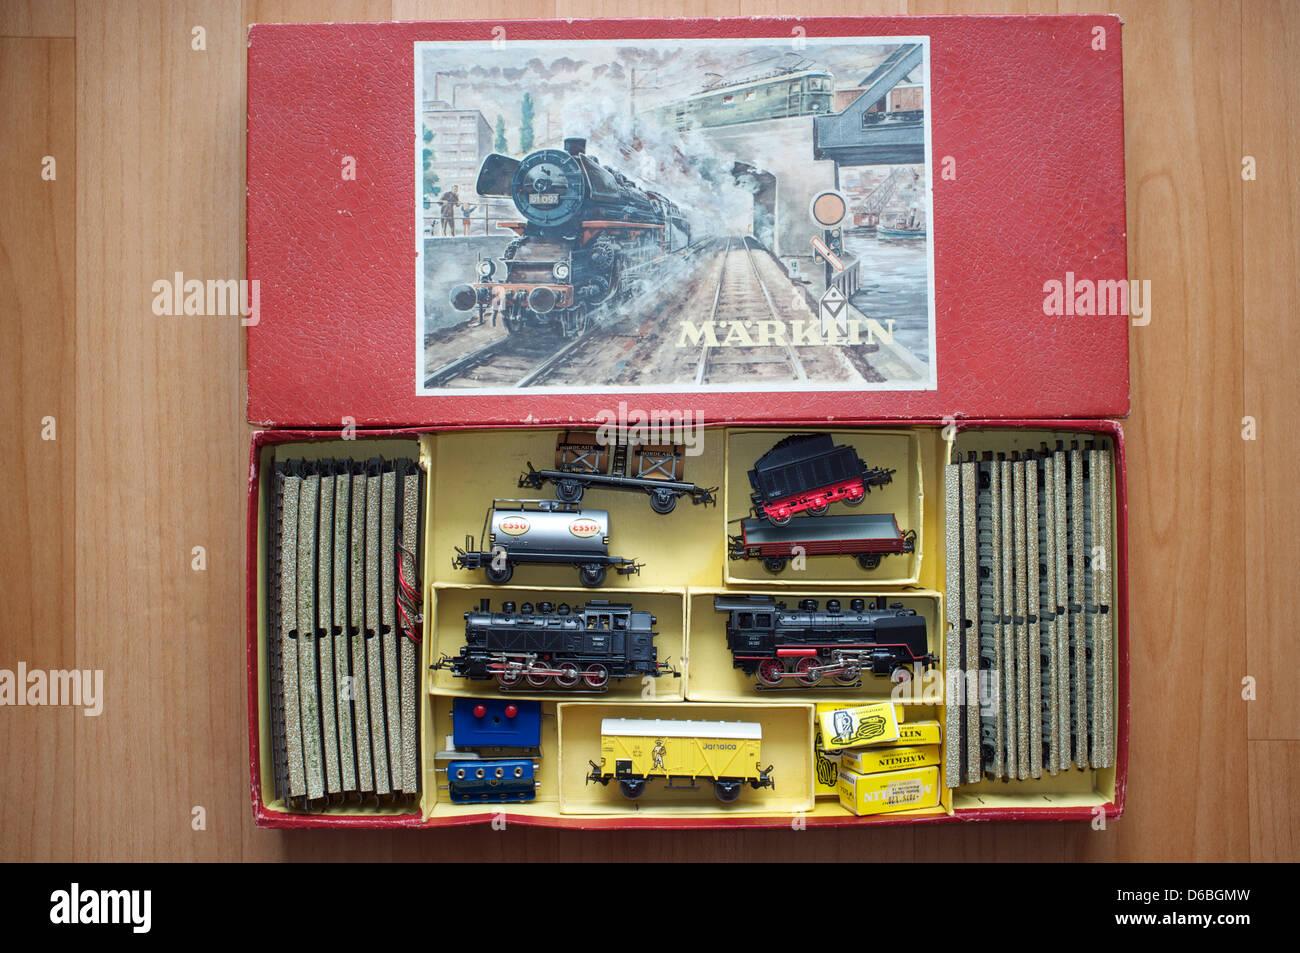 Marklin train set Stock Photo